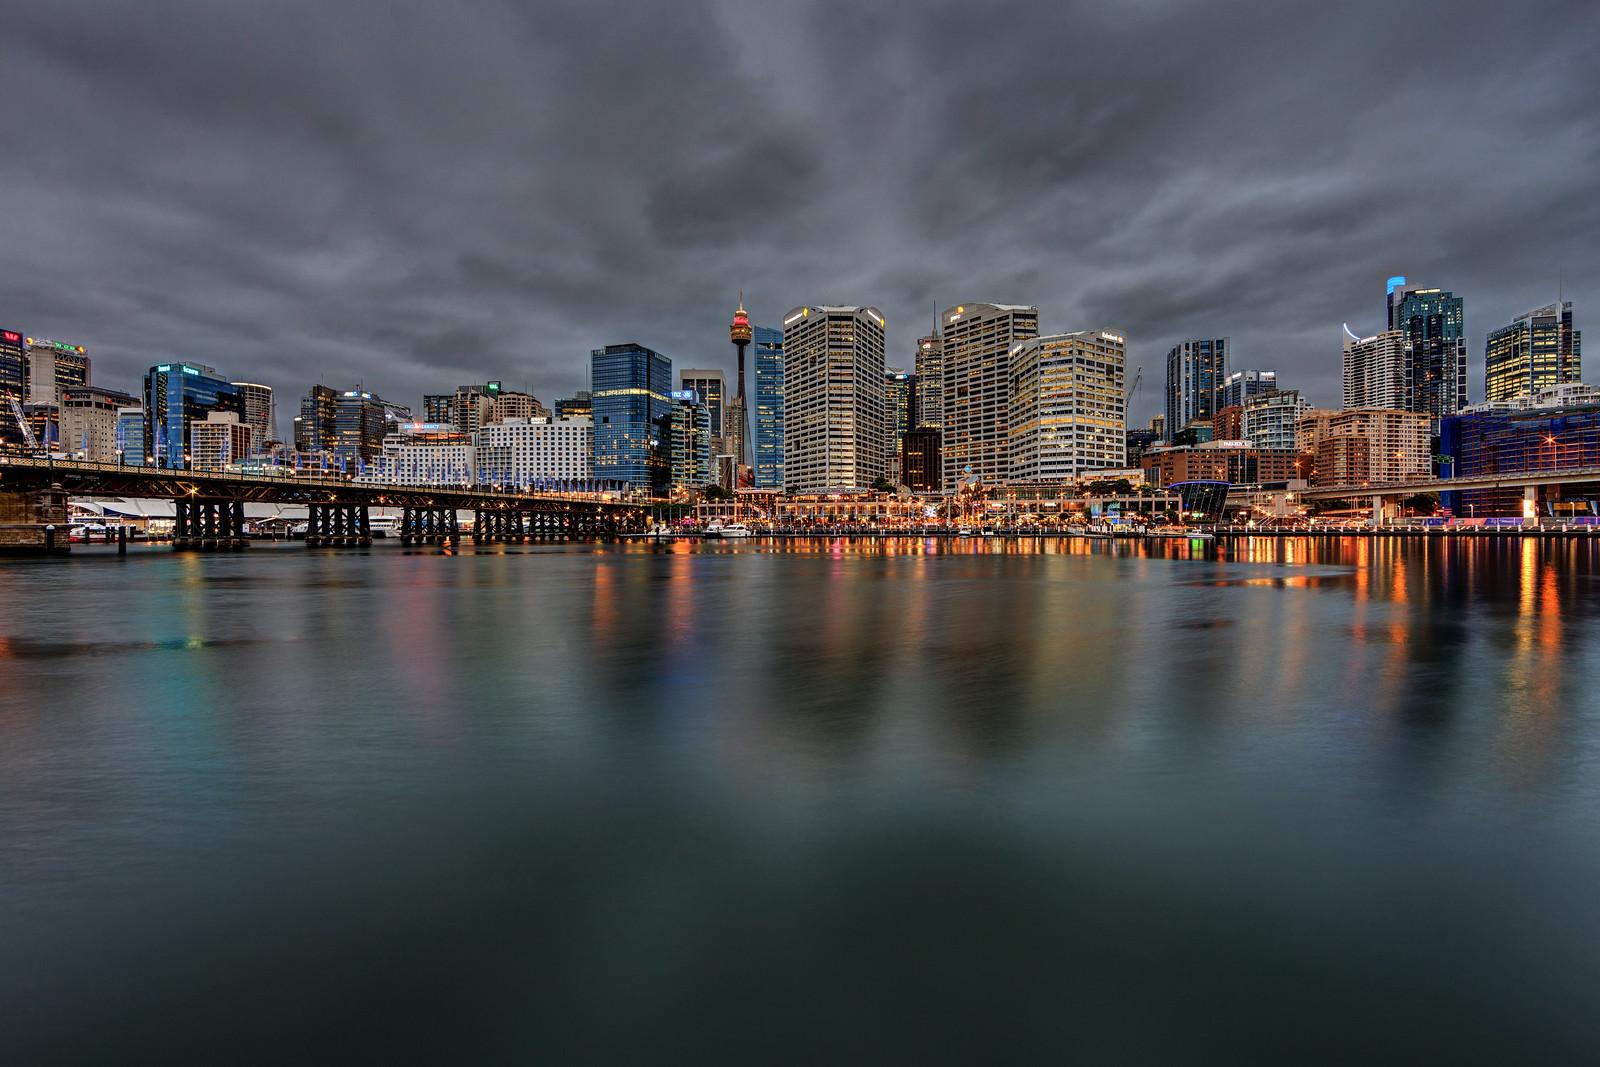 Awakening of the City Night